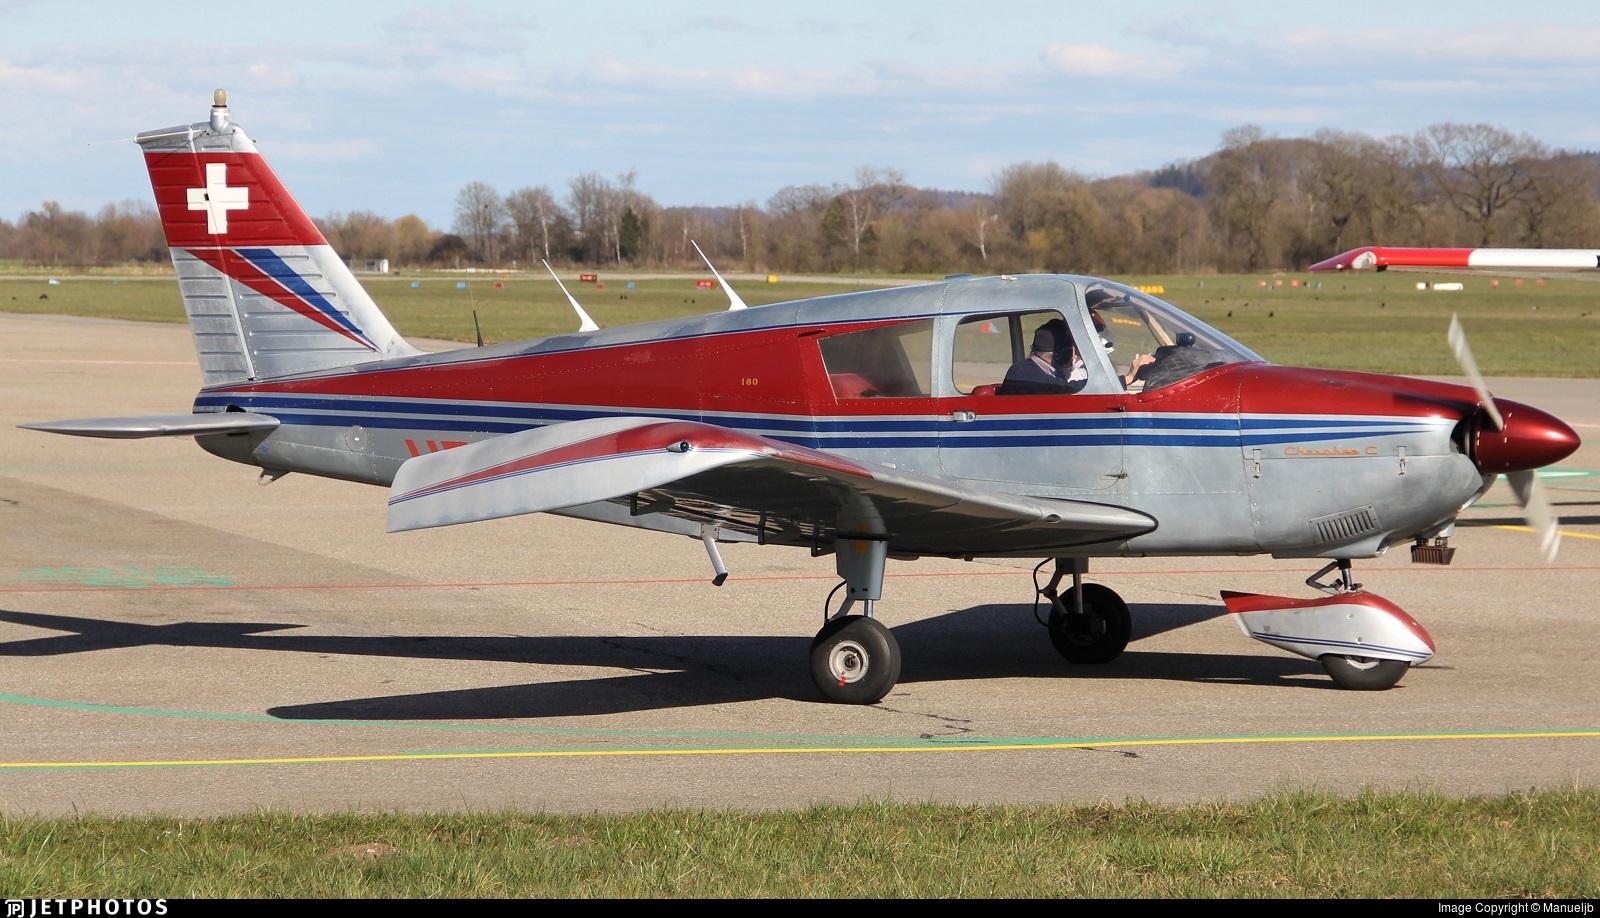 HB-OHC - Piper PA-28-180 Cherokee C - EFOS Flight-Charter